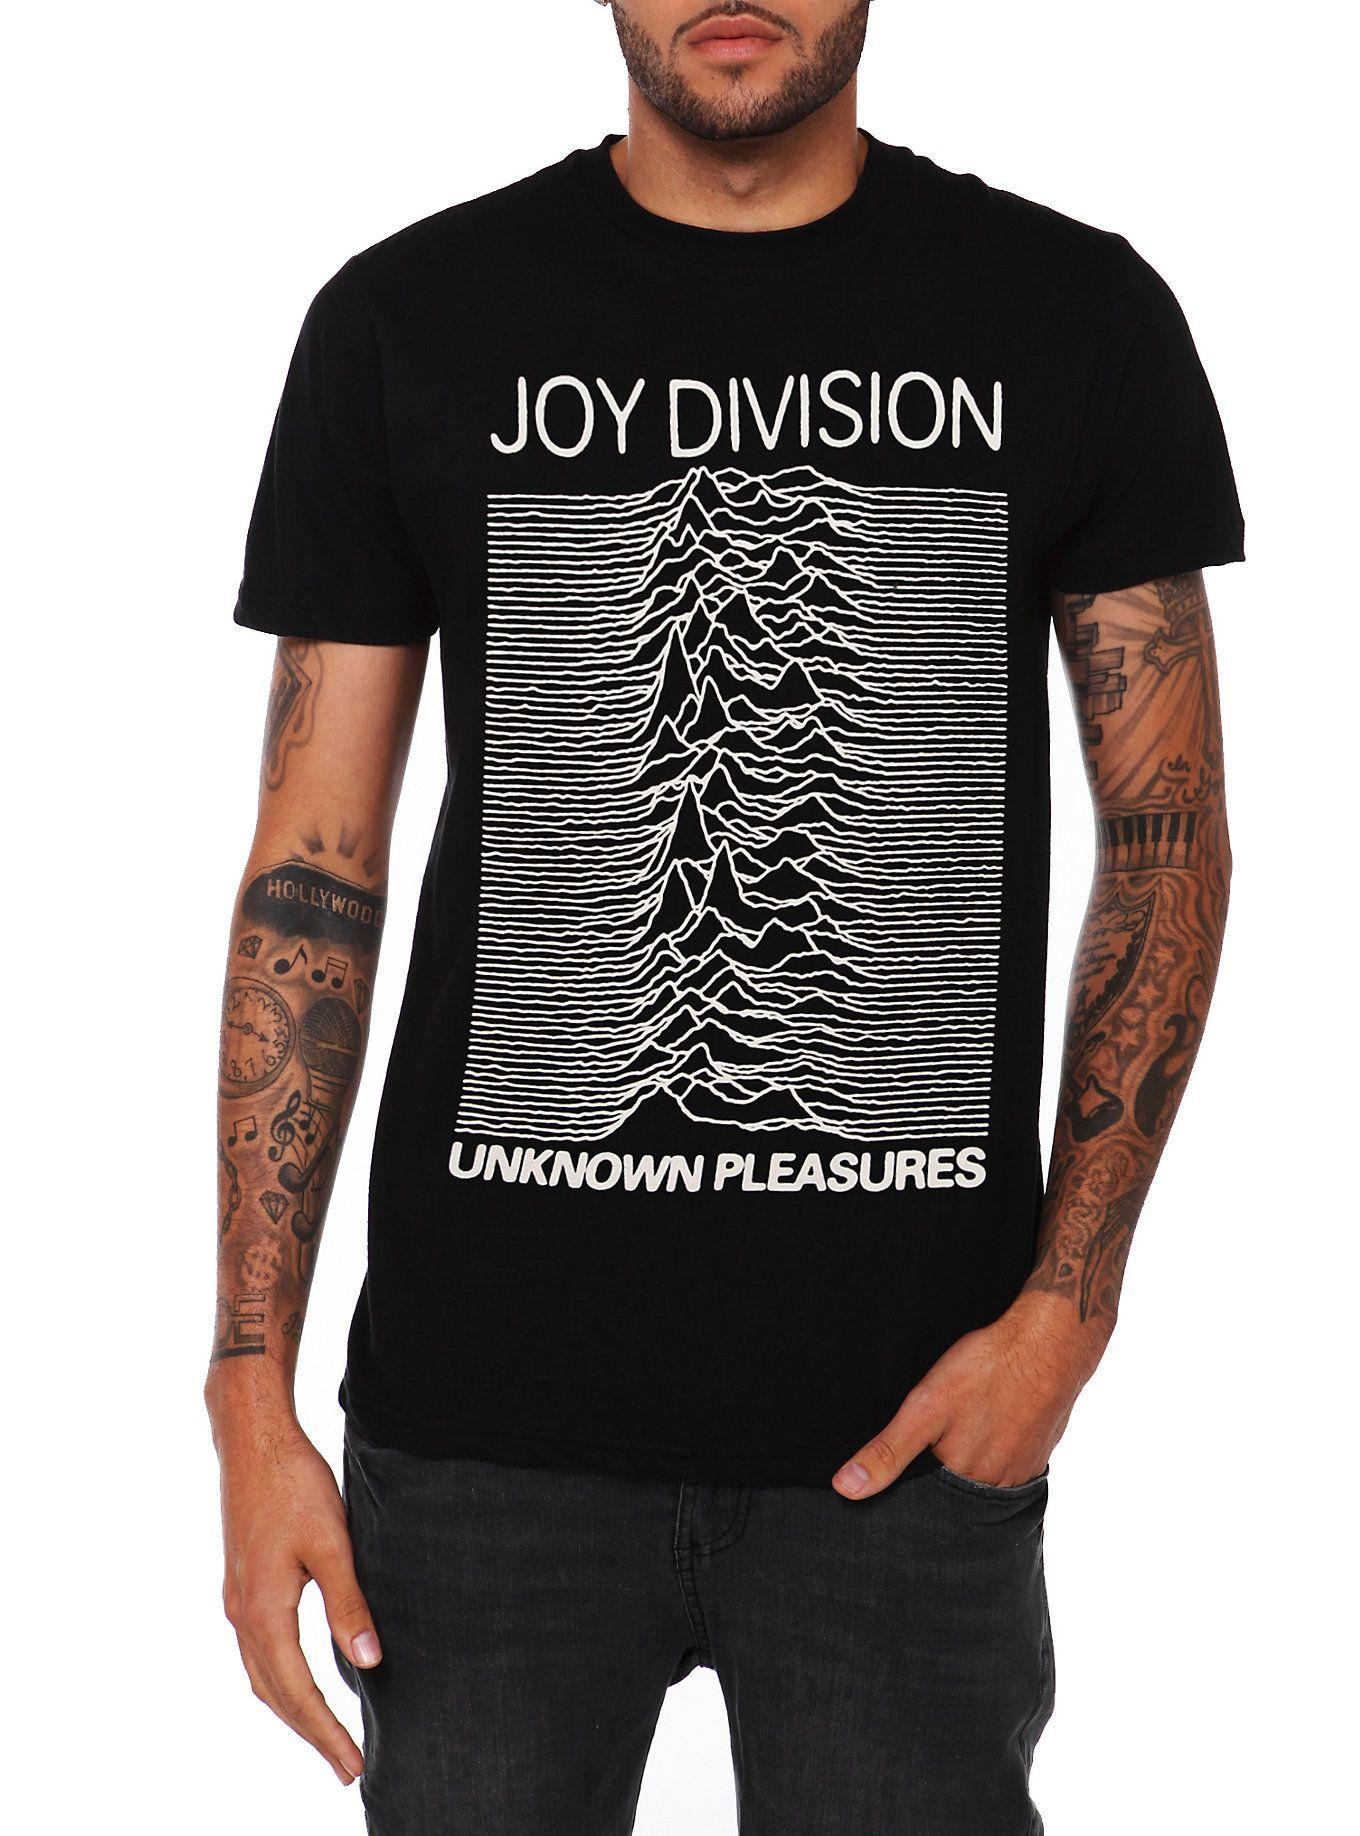 New R.E.M Accelerate Alternative Rock Band Men/'s Black T-Shirt Size S to 3XL